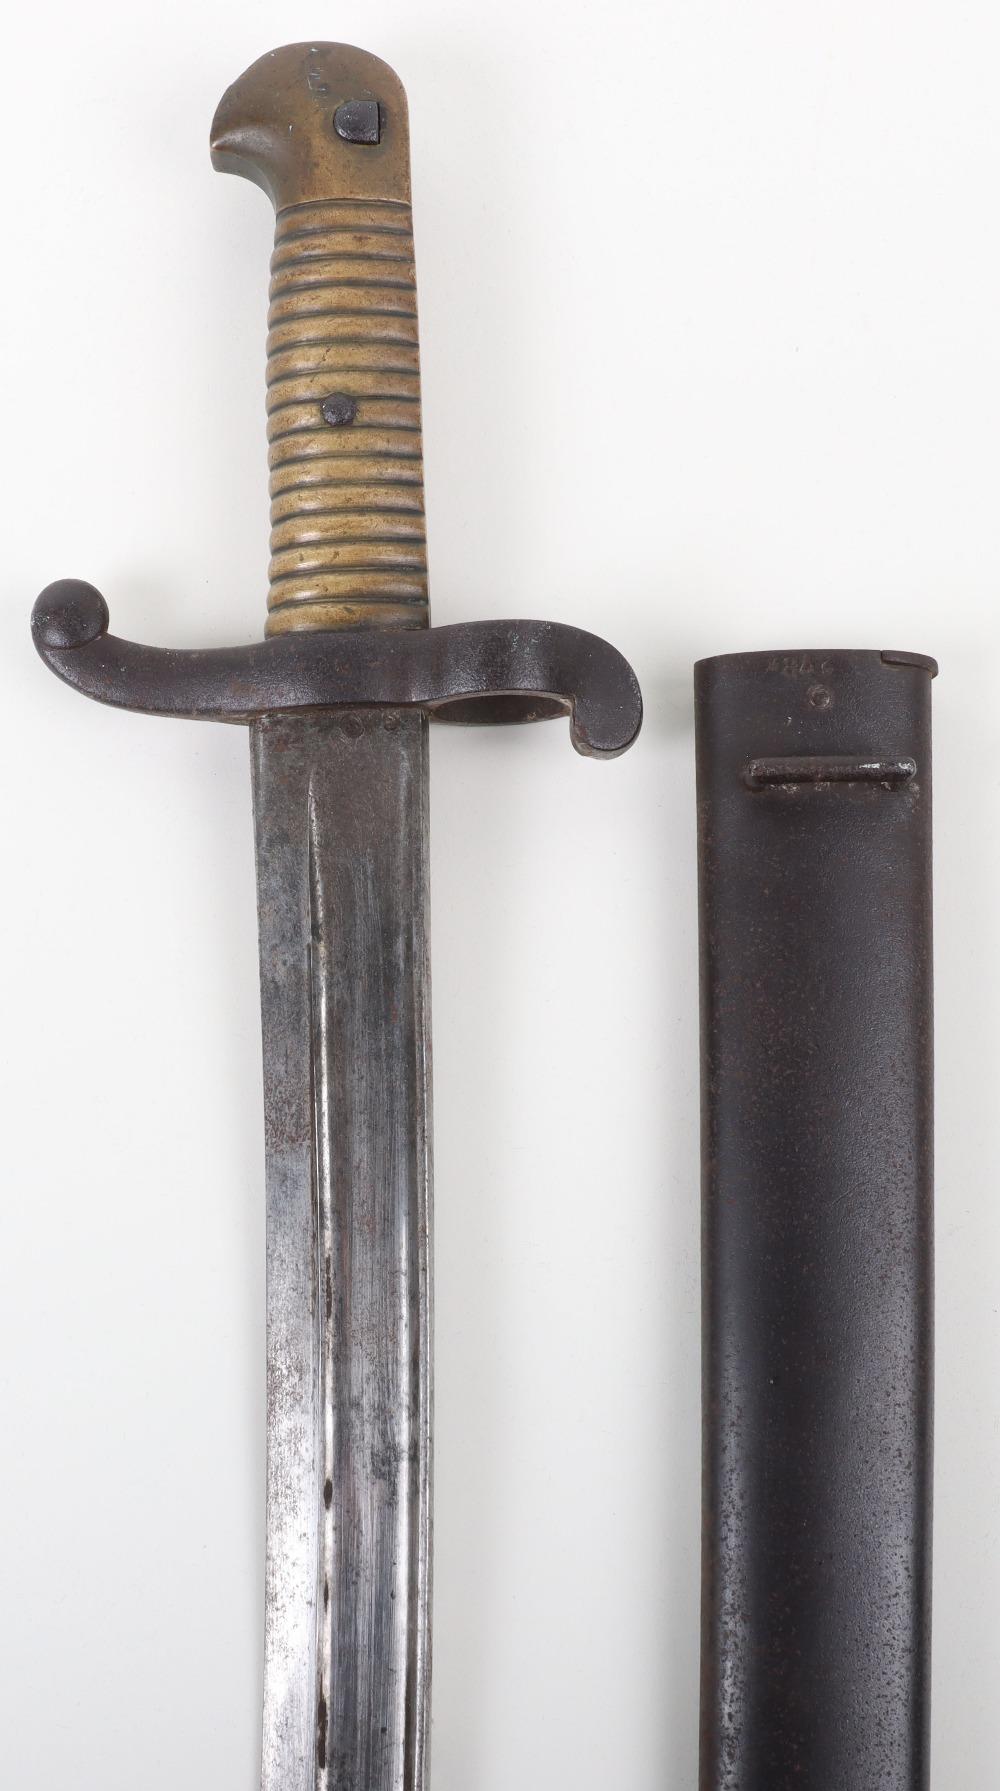 French Model 1842 Sword Bayonet